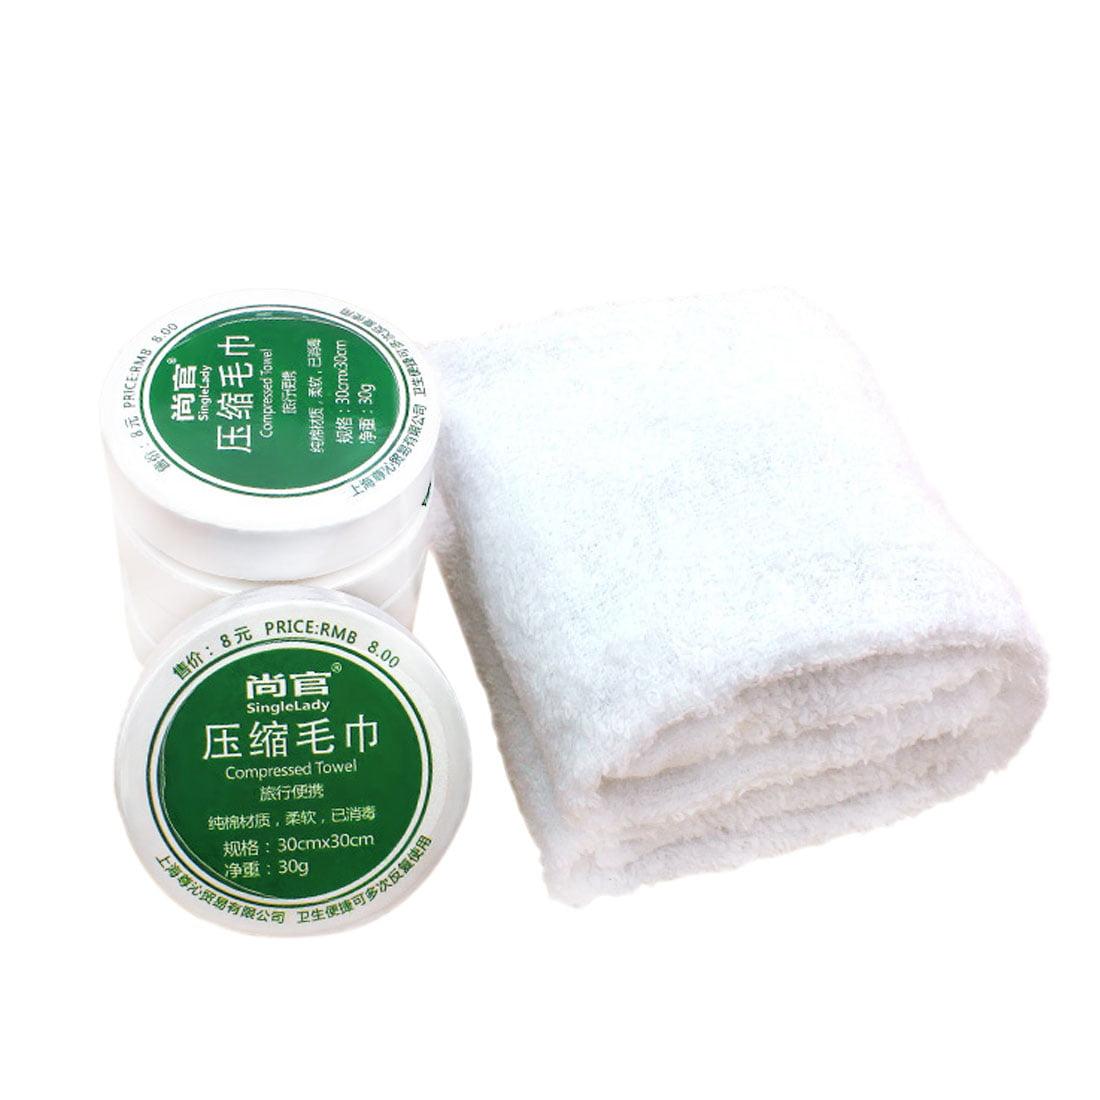 5pcs Portable Towel Compressed Towel Trip Travel Easy Carry Washcloth Towel